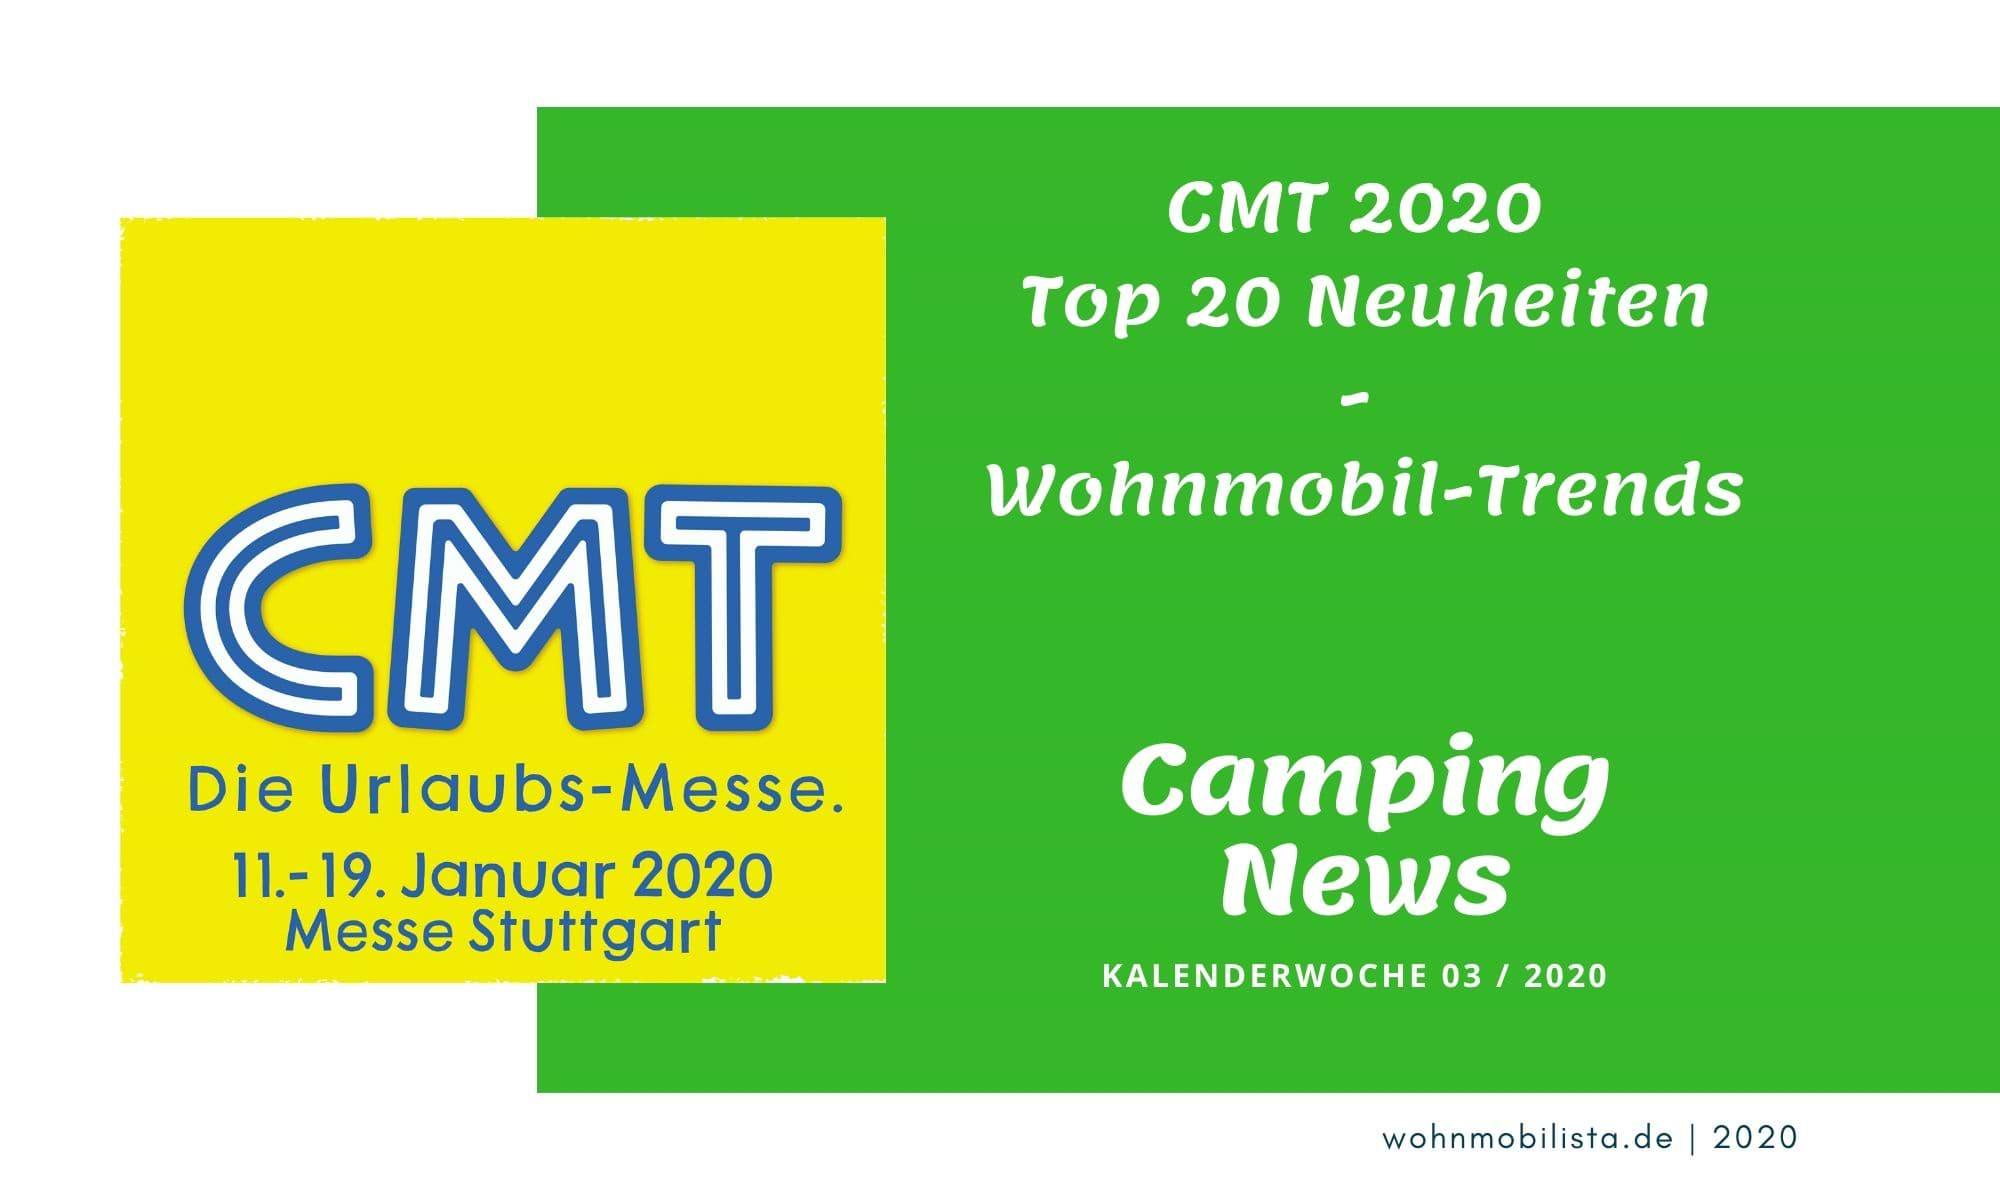 Wochenrückblick Camping News KW03-2020